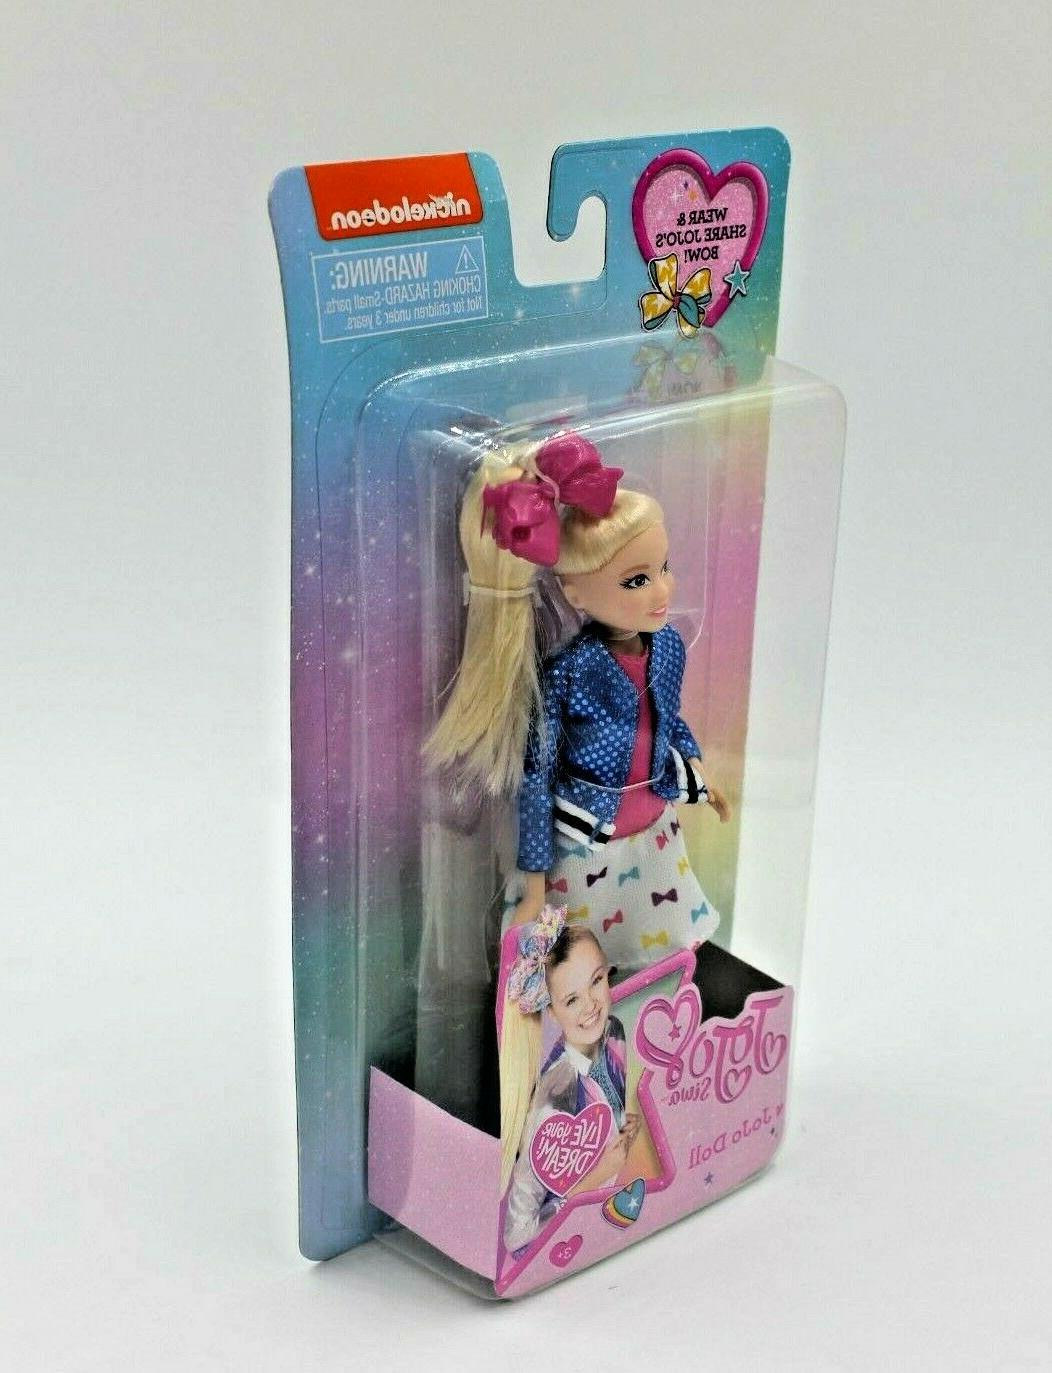 JoJo Nickelodeon Share Bow doll